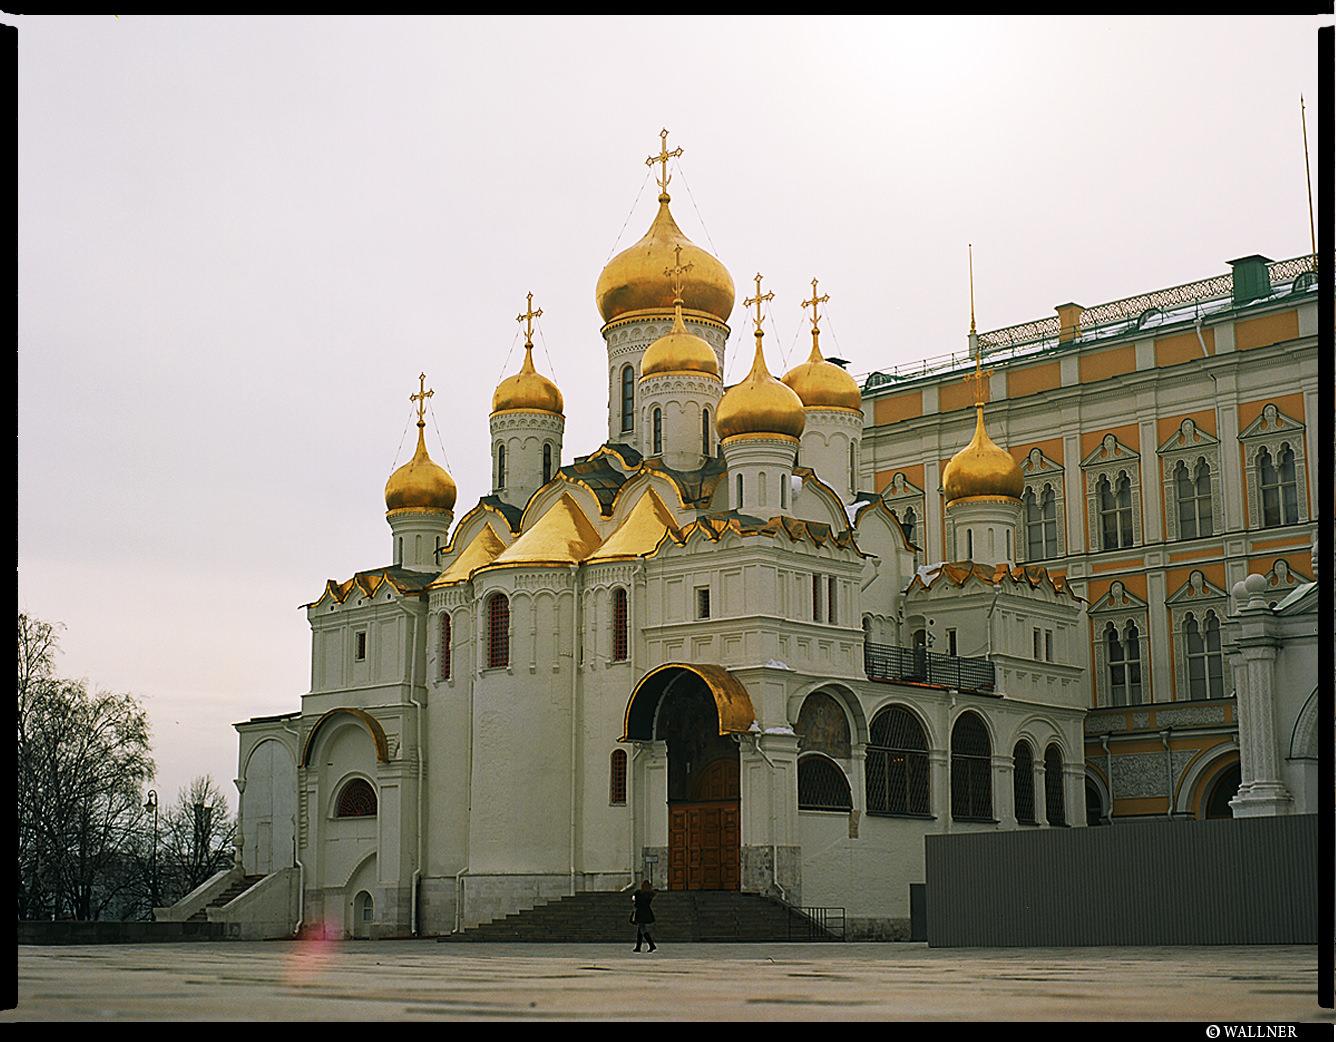 MediumFormatPatrikWallner_Moscow_KremlinLOWQ